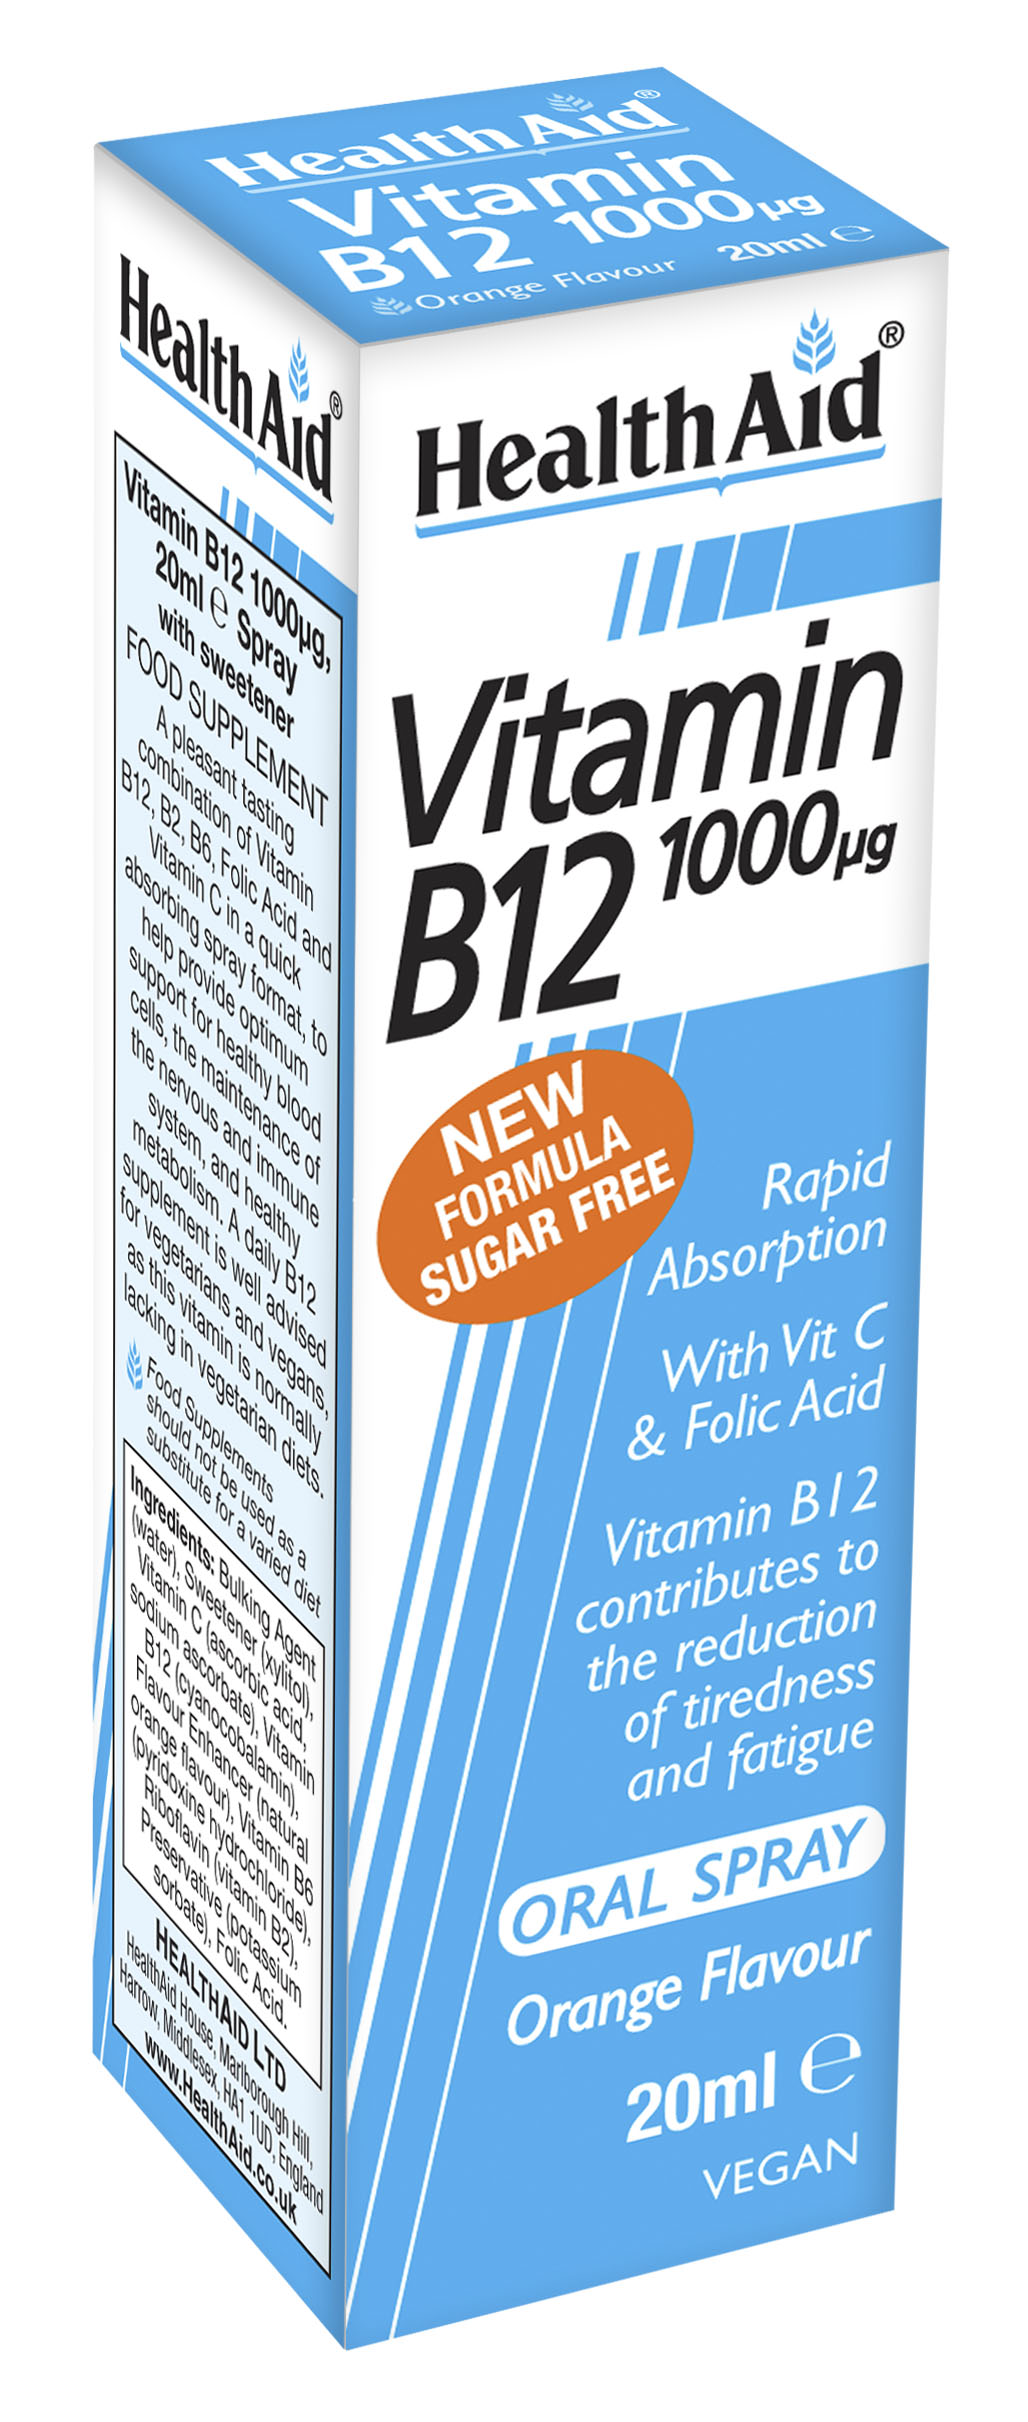 Vitamin B12 1000ug Oral Spray 20ml